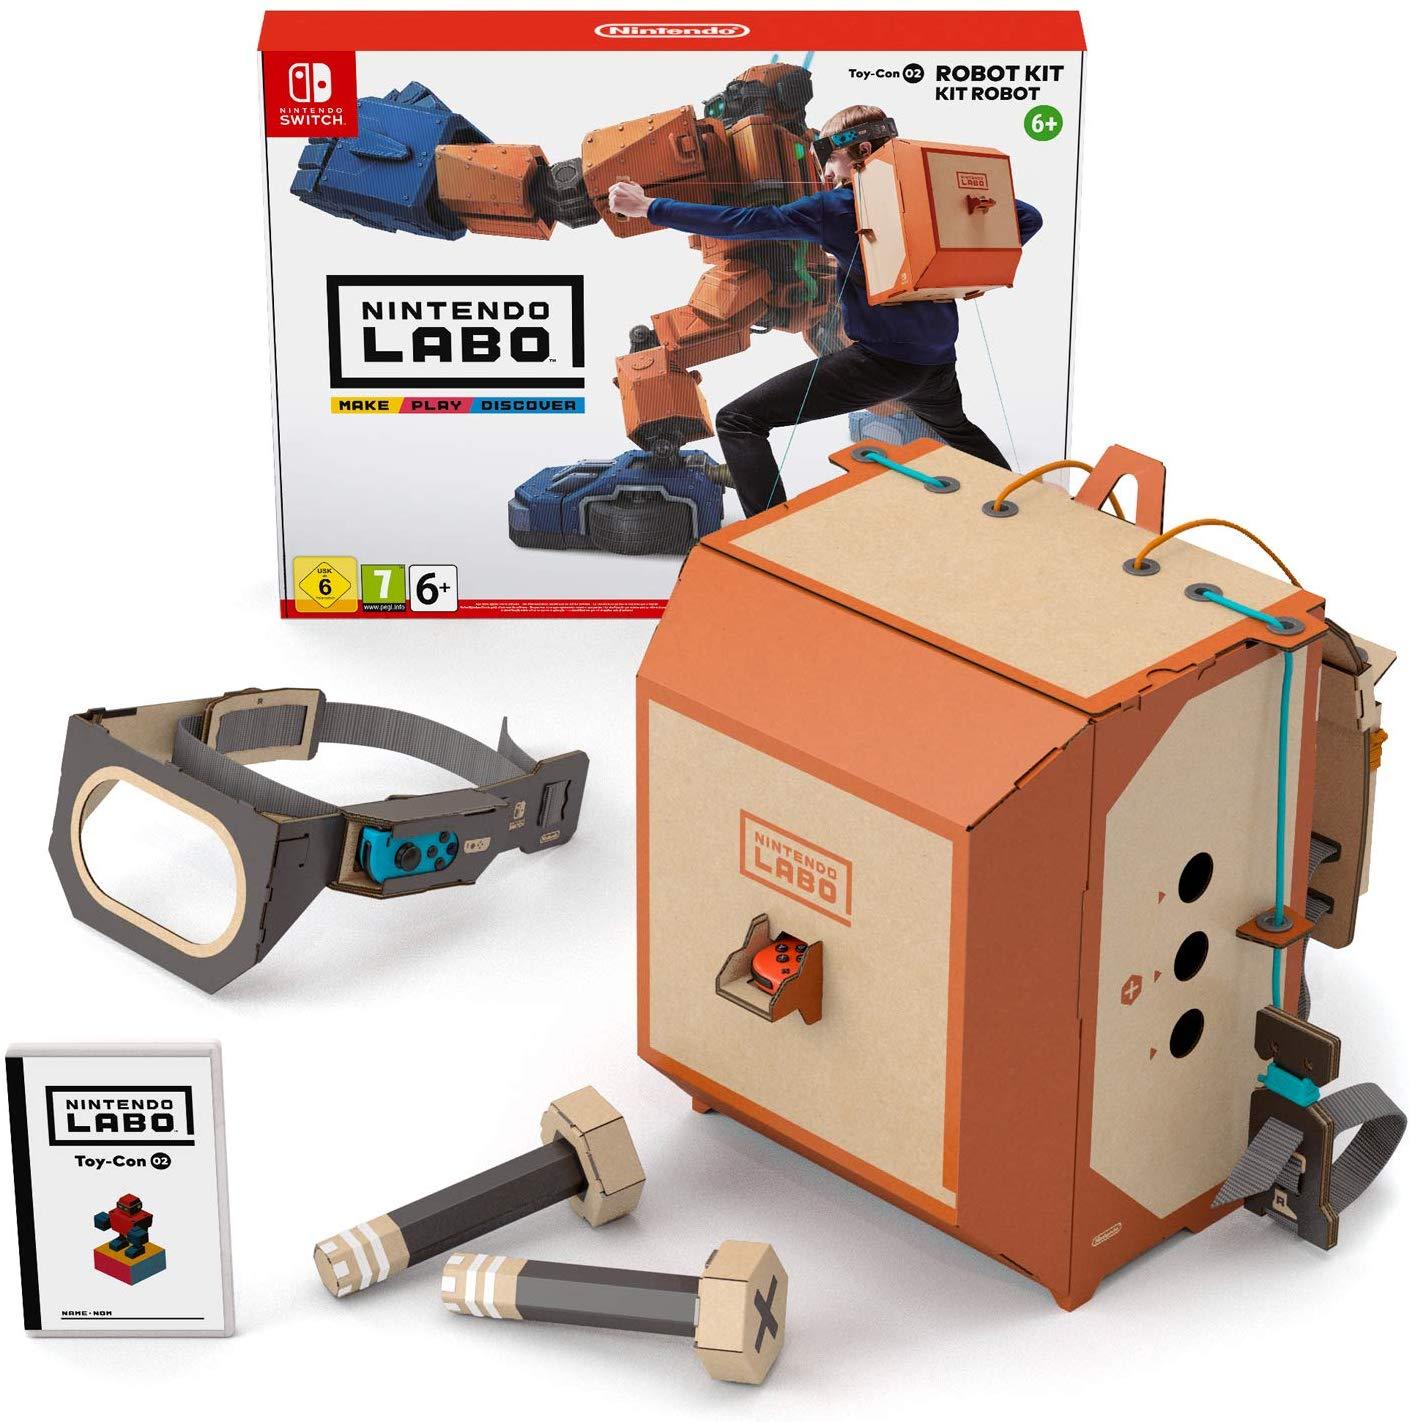 [Nintendo Switch] Nintendo Labo Robot Kit £10.99 (Prime) £15.48 (Non Prime) @ Amazon (in stock 14th February)